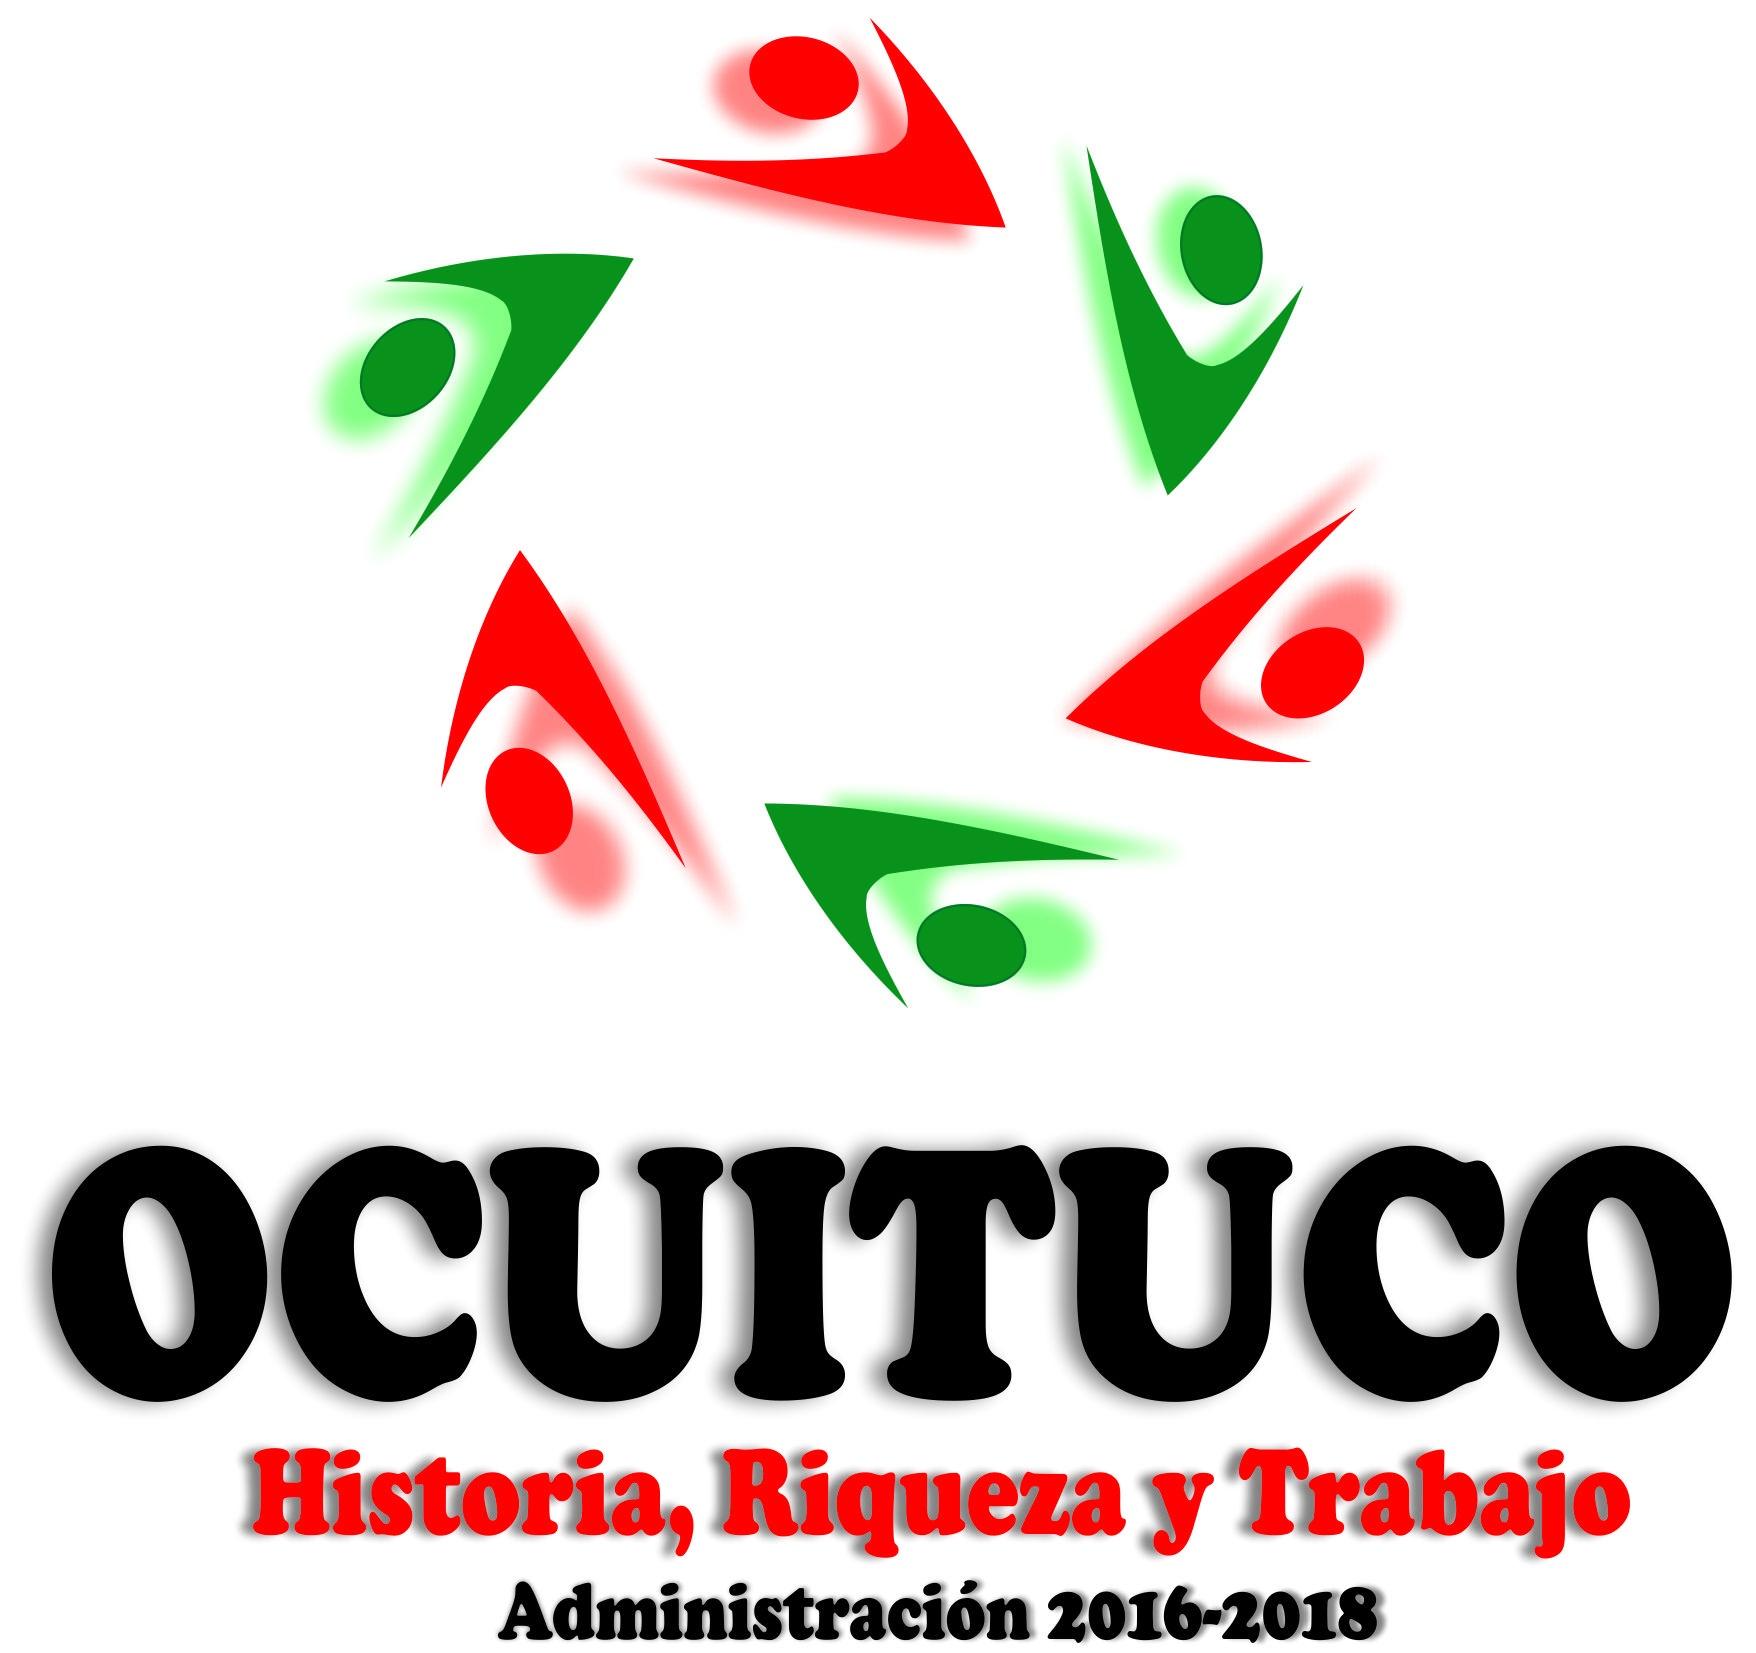 https://0201.nccdn.net/1_2/000/000/182/1e6/Logo-ocuituco-1756x1653.jpg